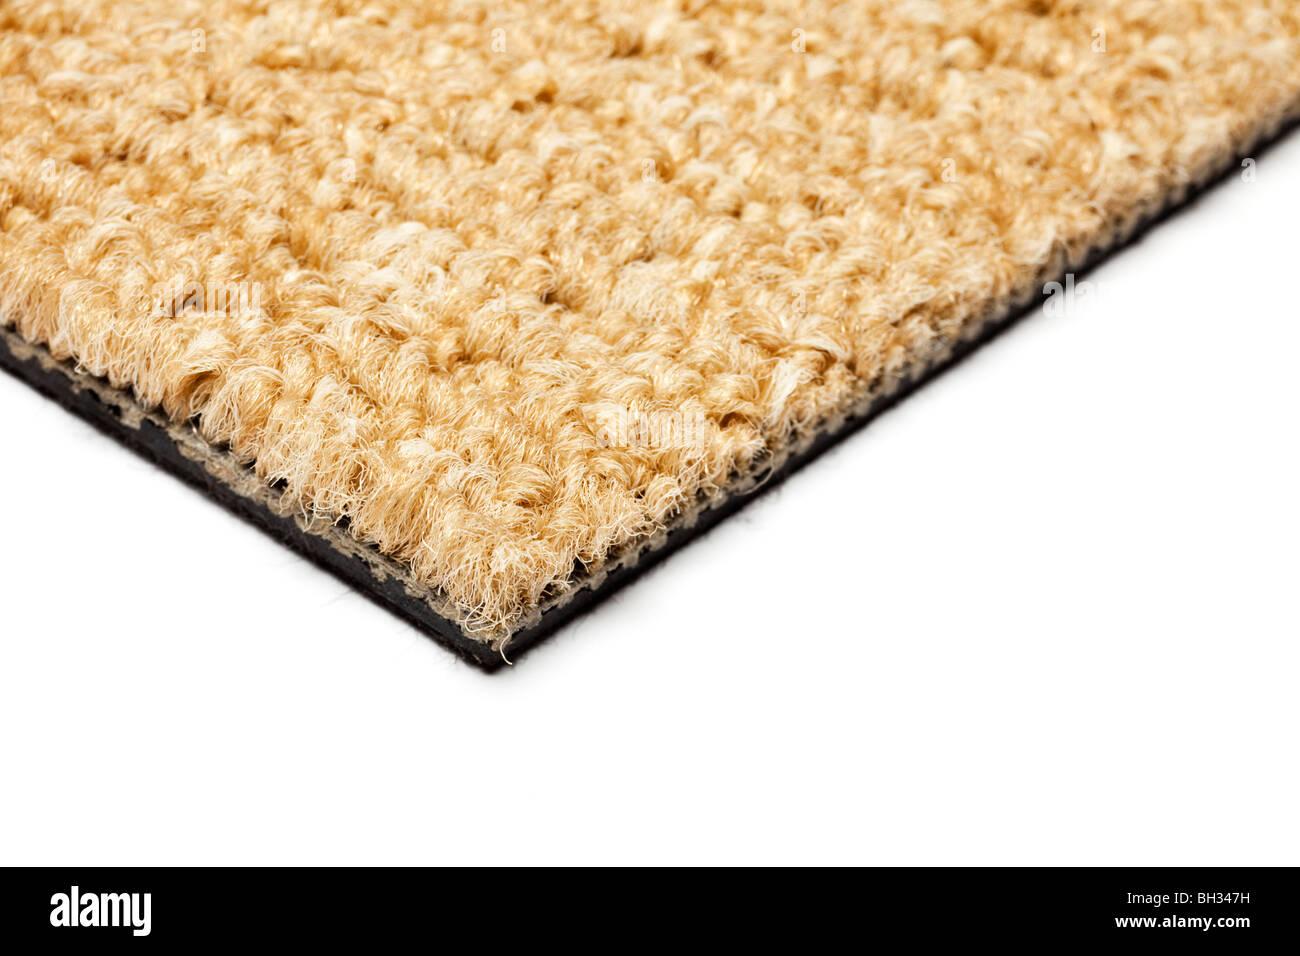 Carpet close up selective focus showing edge - Stock Image